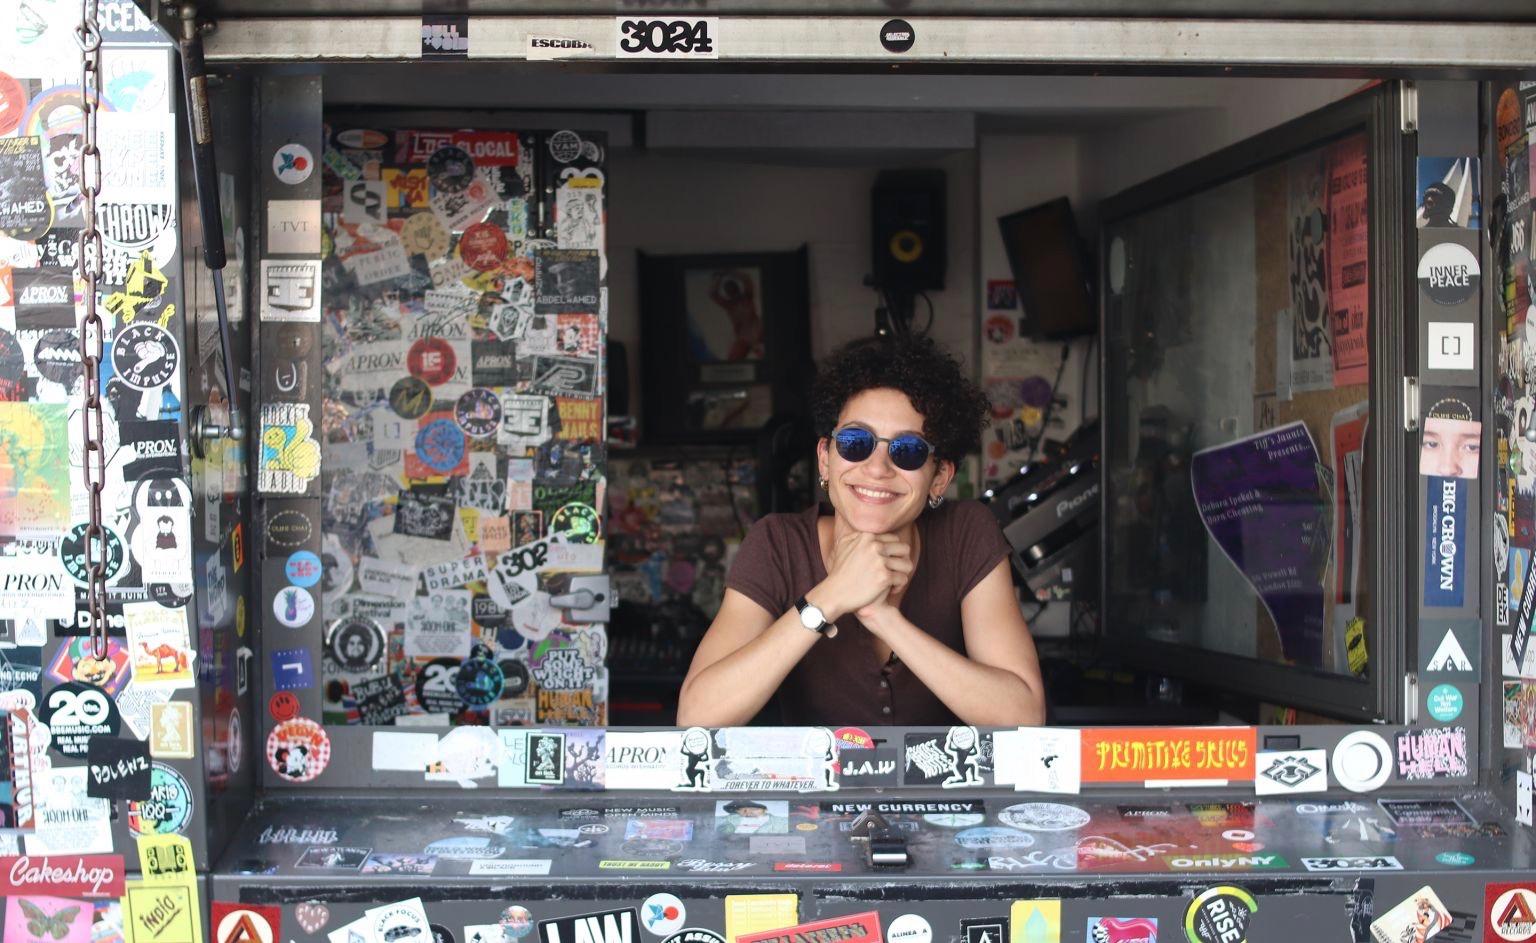 Tunisian DJ/Producer Deena Abdelwahed Aced Her NTS Radio Set